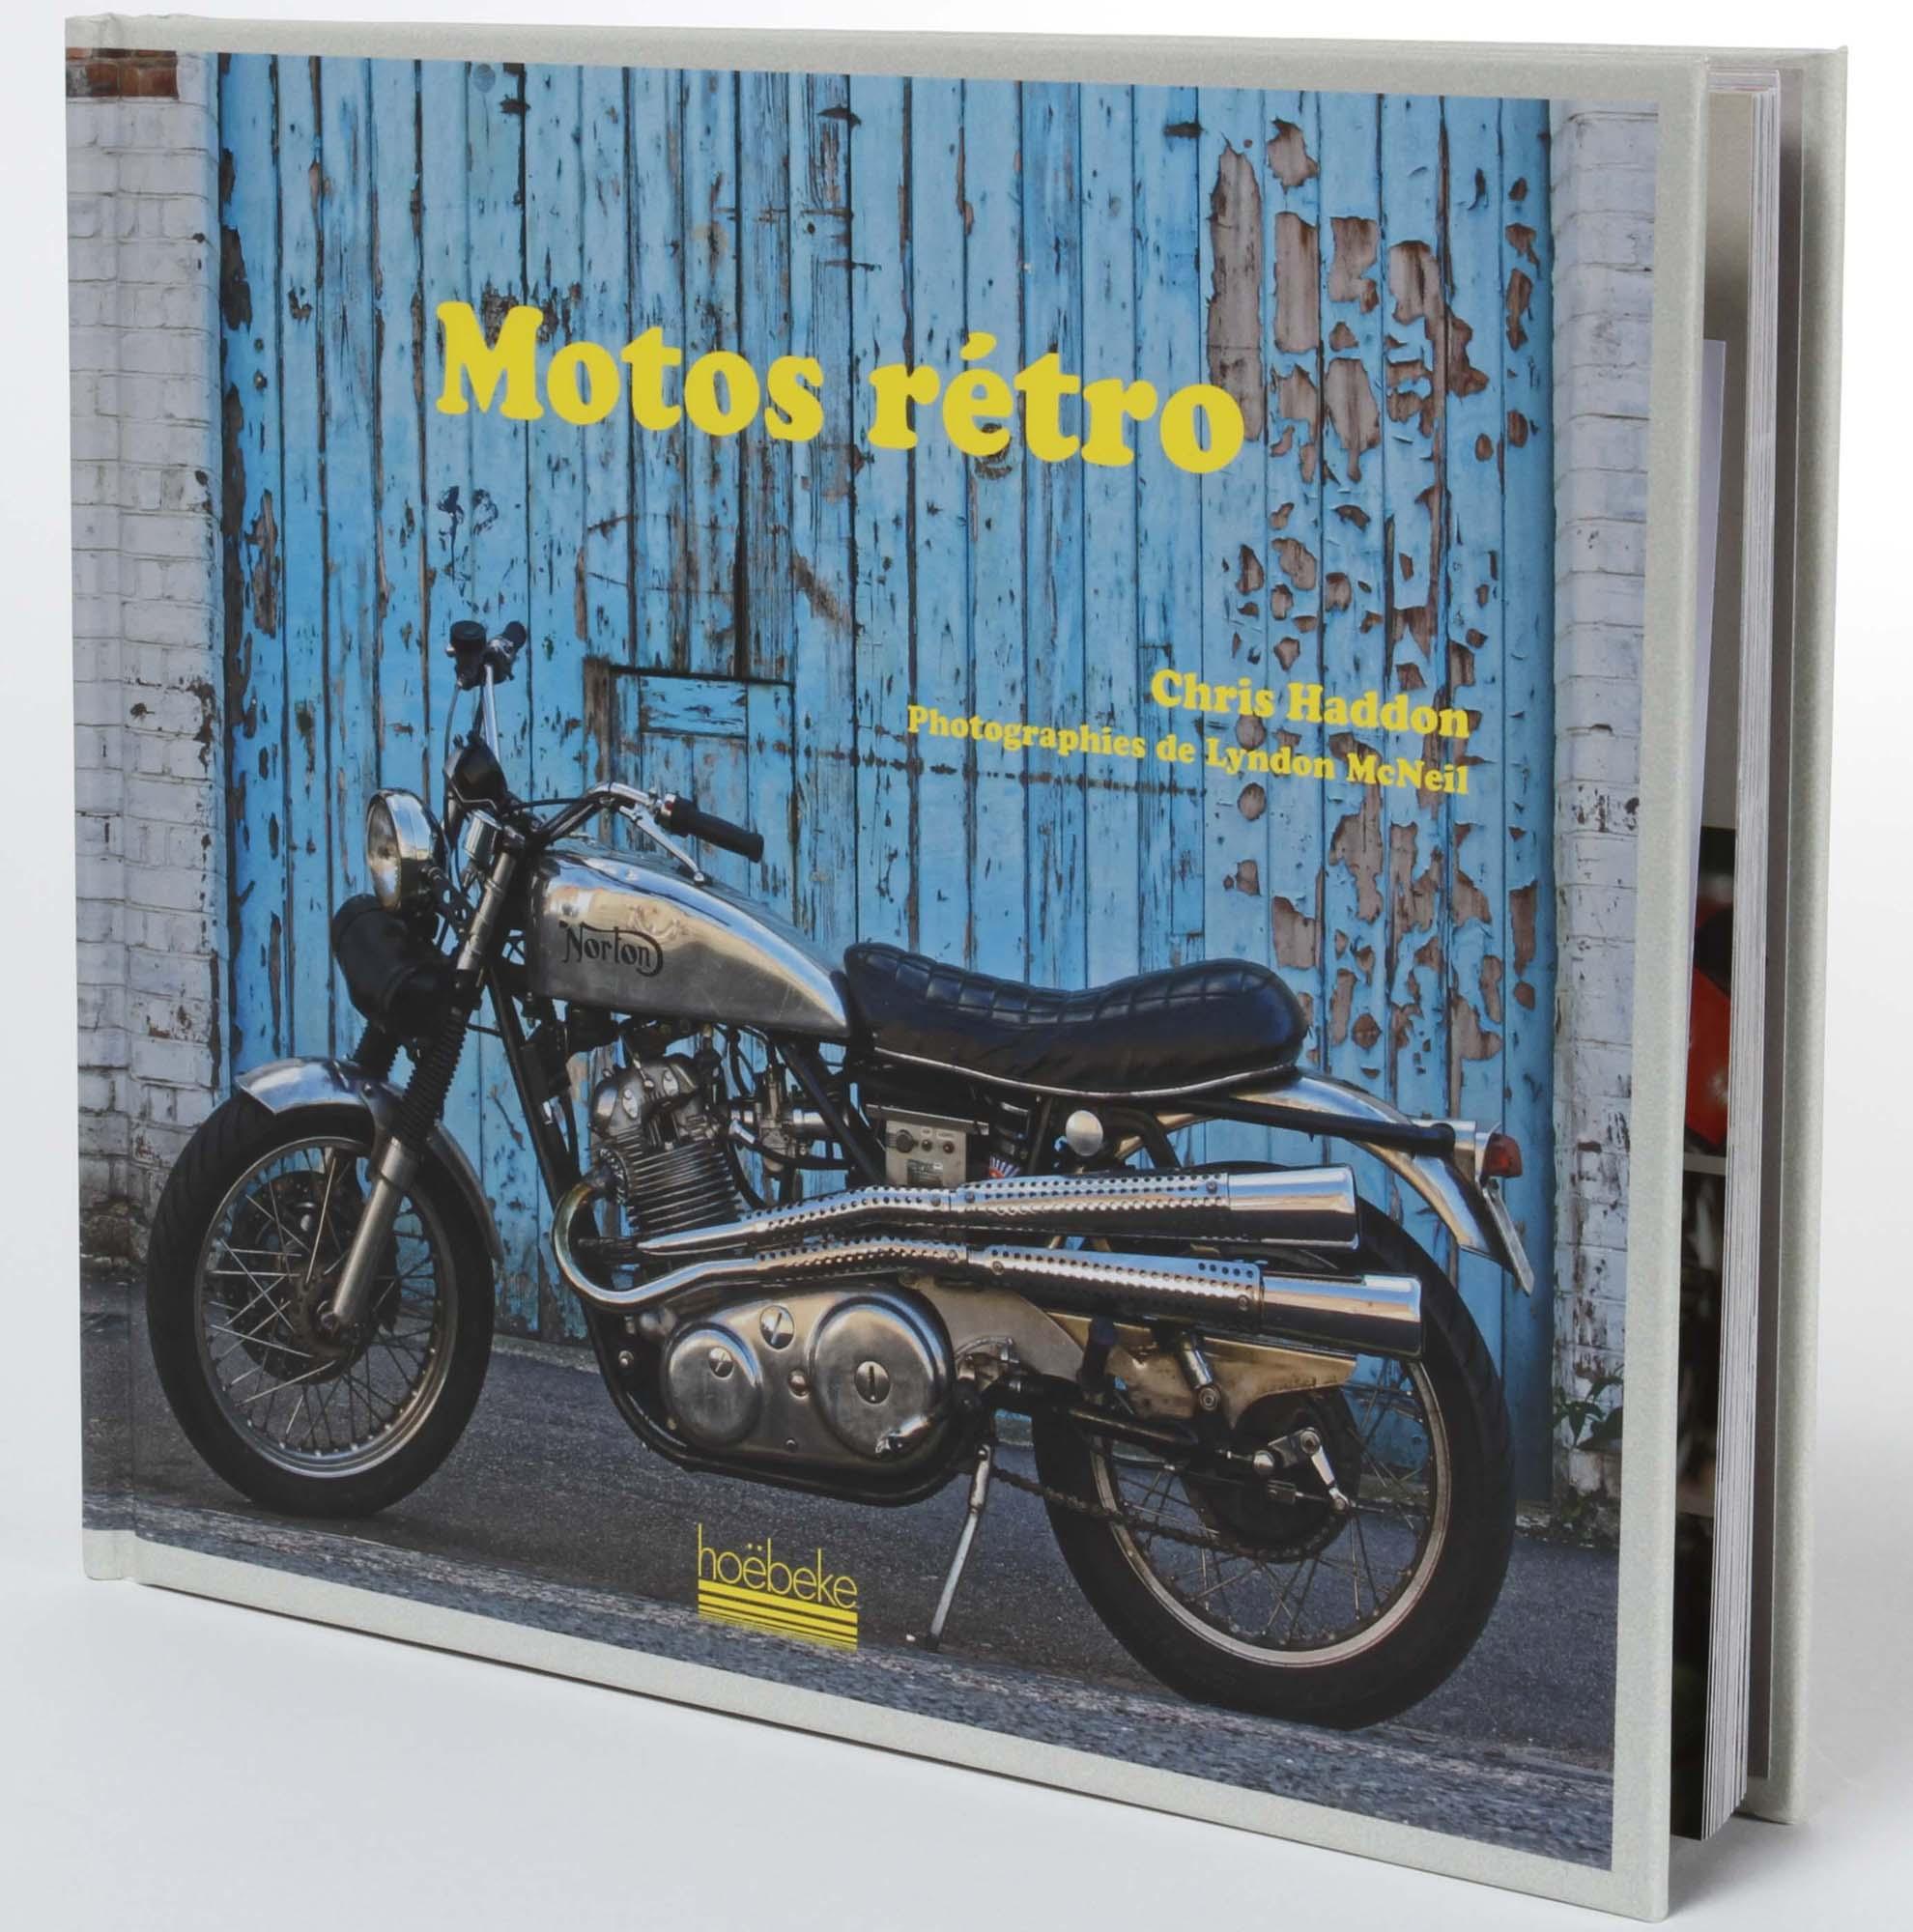 sp cial cadeaux cinq livres moto examin s la loupe moto magazine leader de l actualit. Black Bedroom Furniture Sets. Home Design Ideas